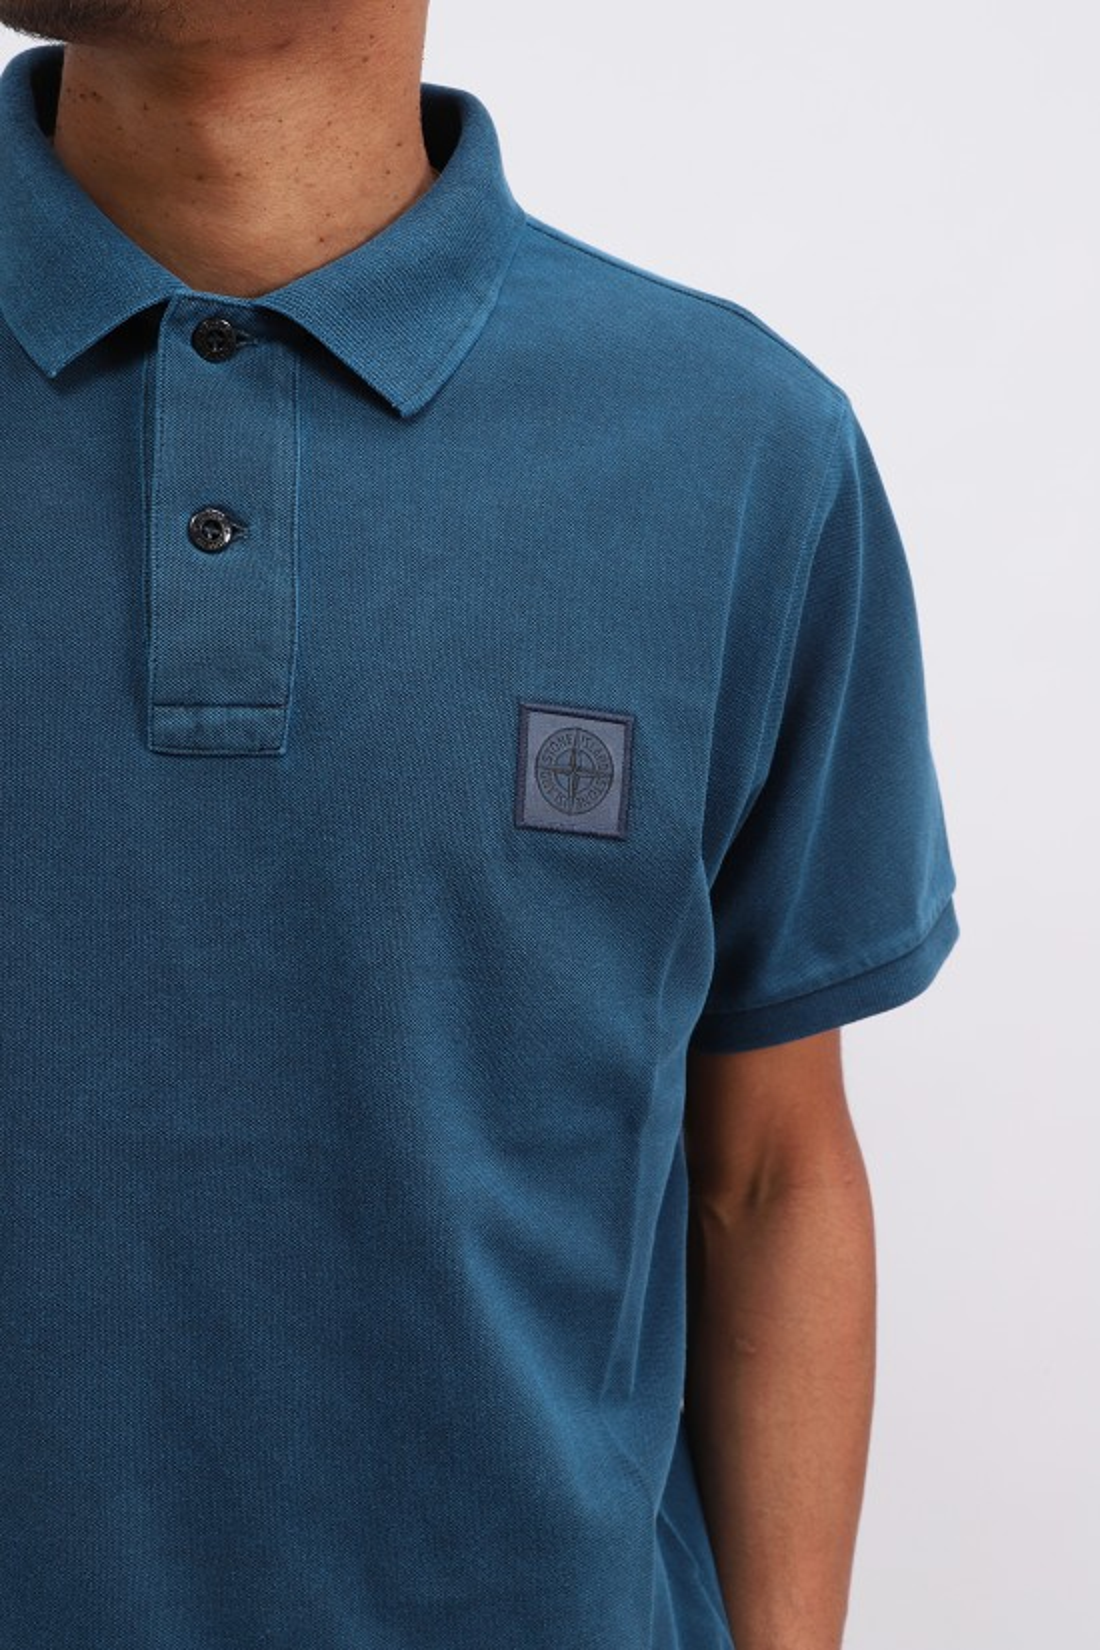 STONE ISLAND / 22s67 polo shirt v0024 Avio